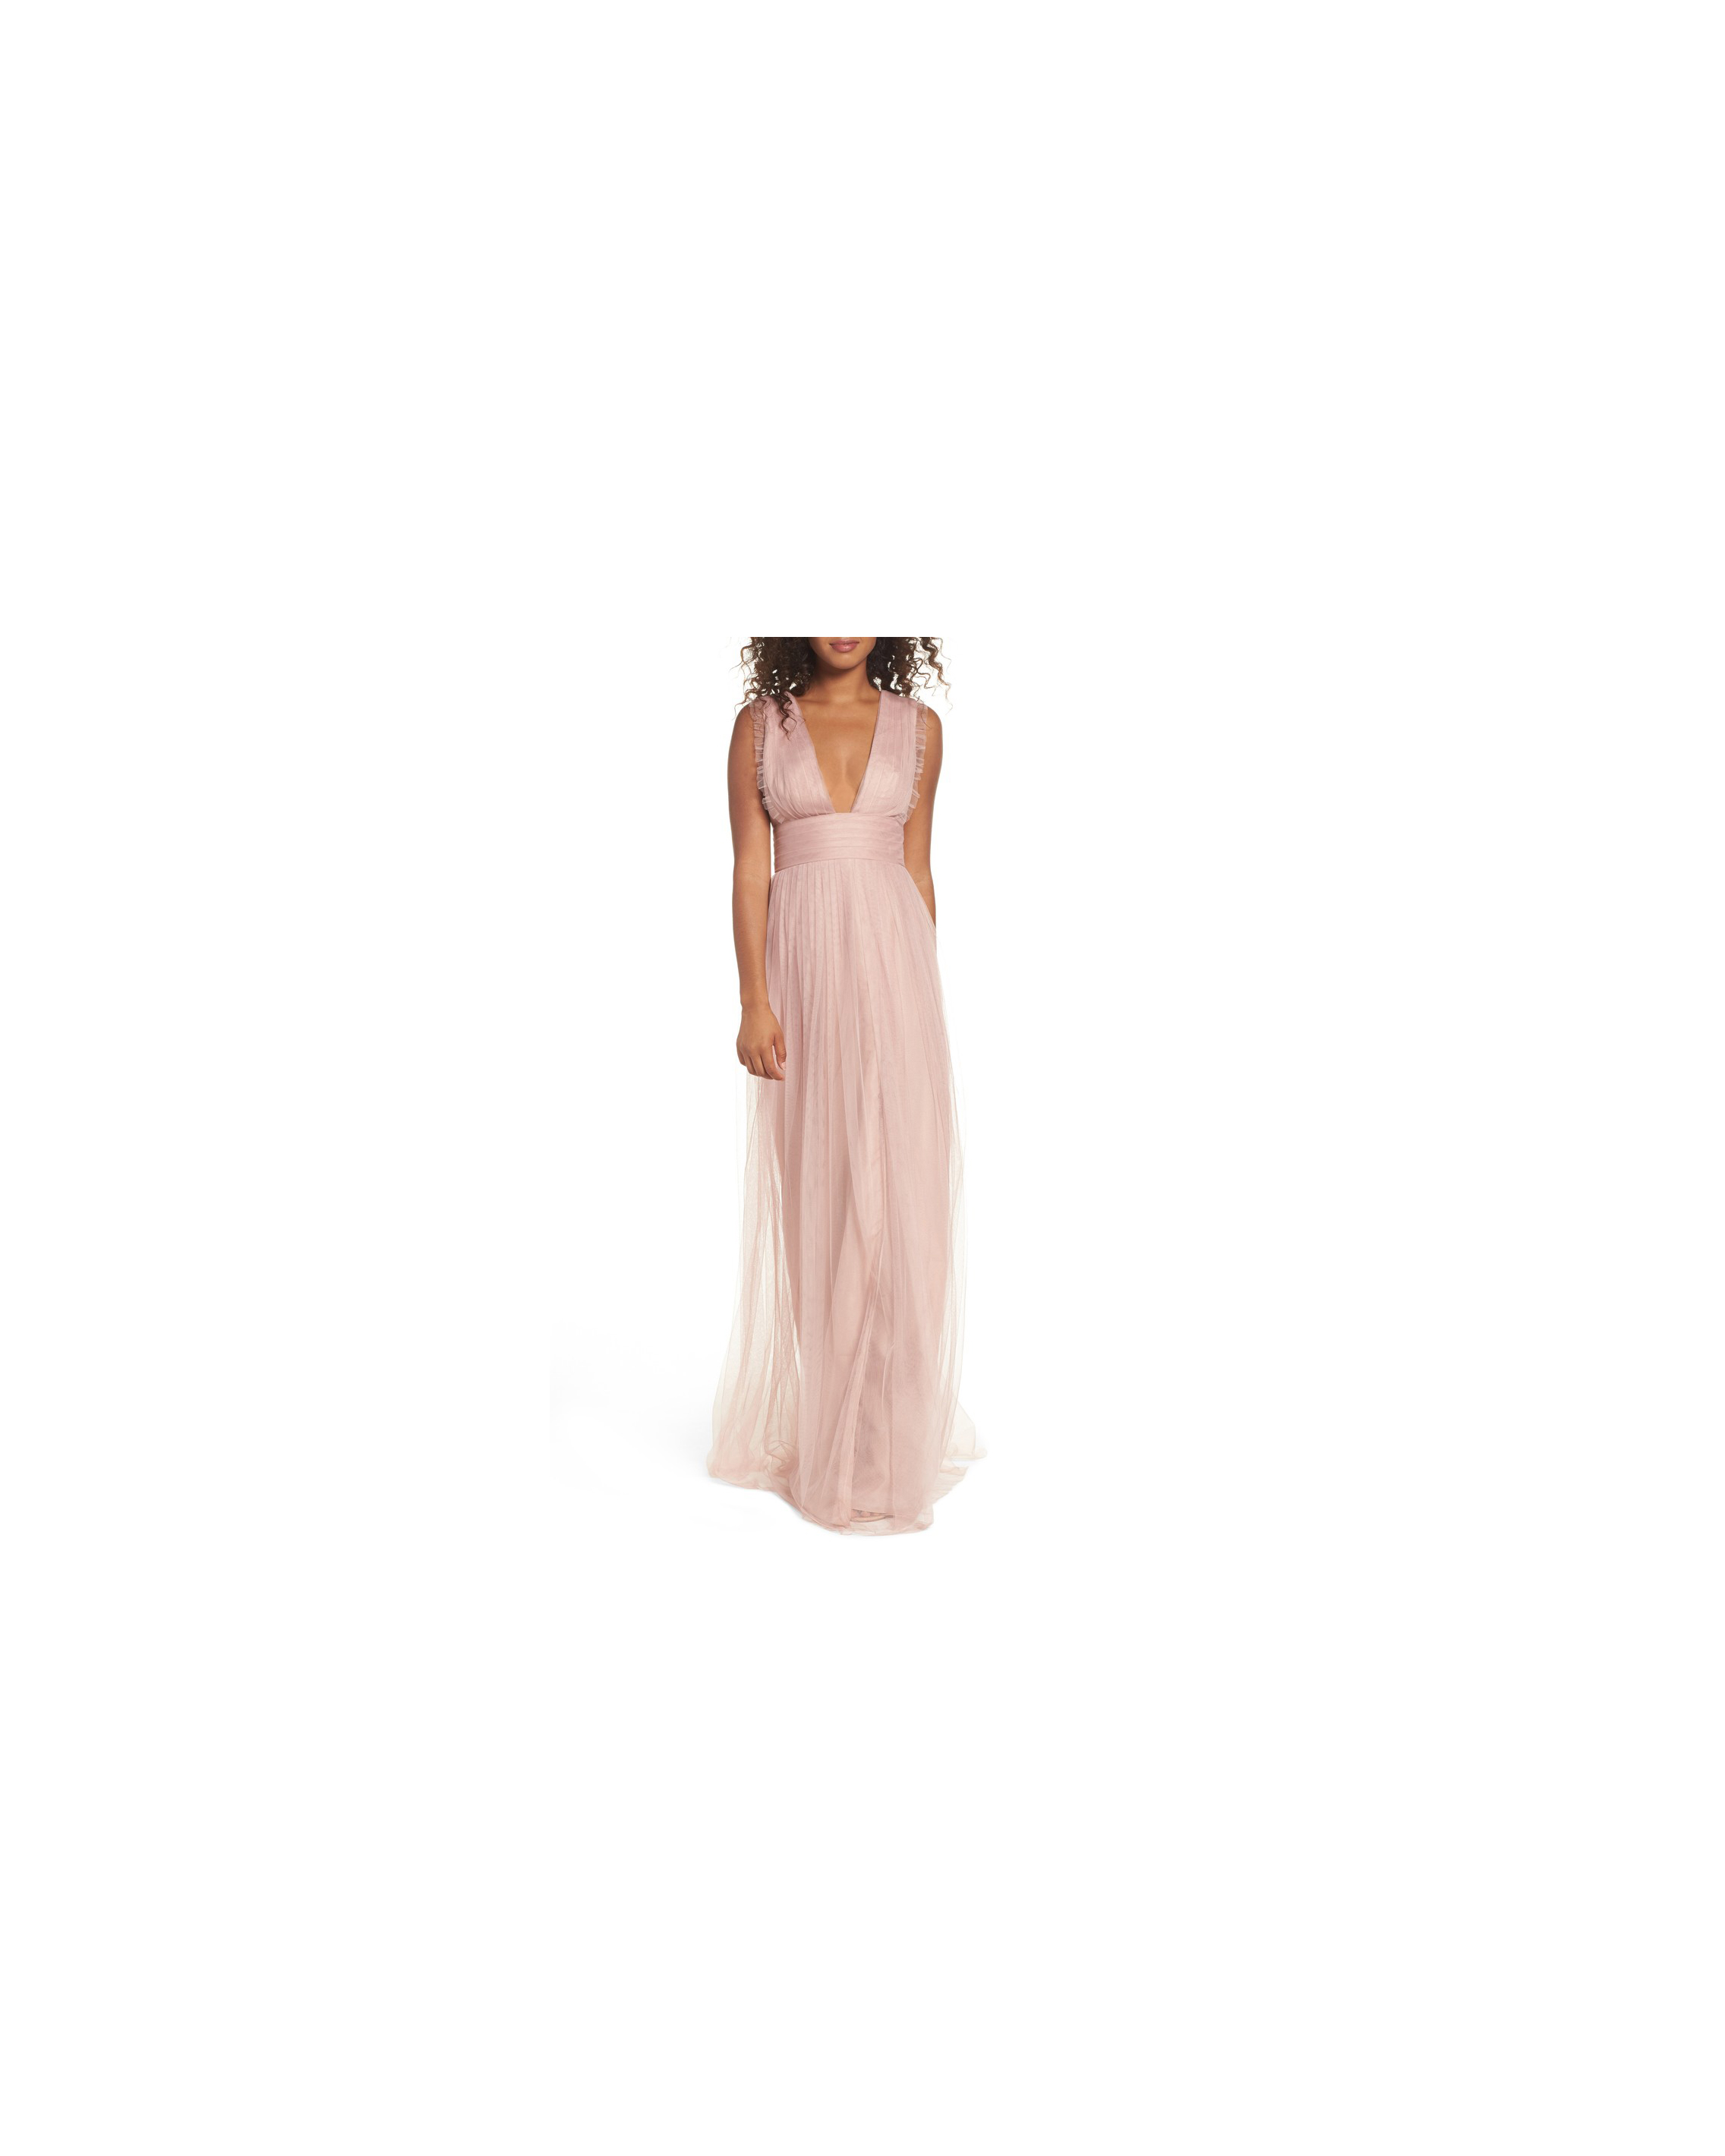 beige neutral bridesmaid dresses monique lhuillier isla